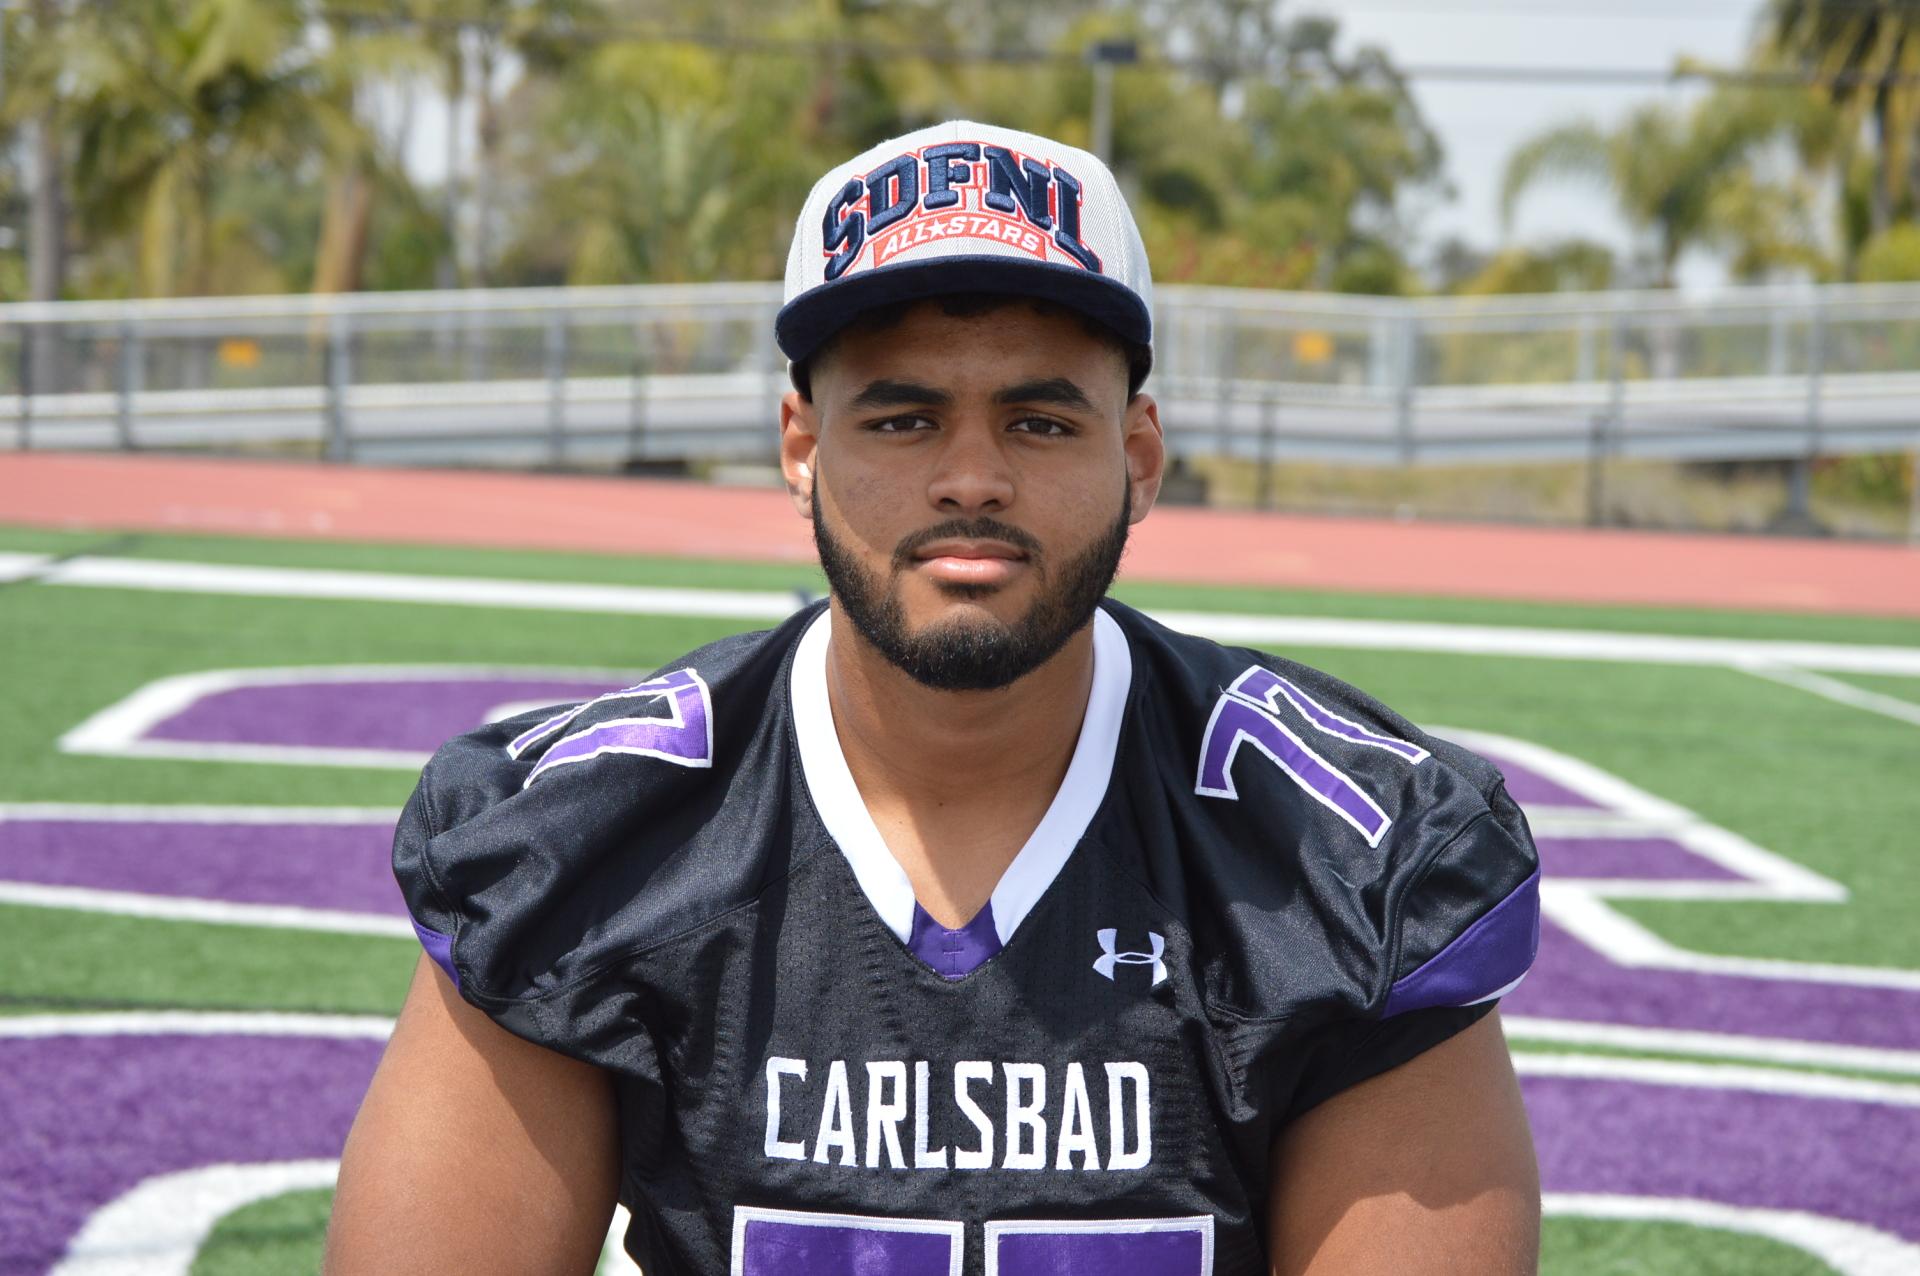 Carlsbad High School - Lineman Carlos Harrison